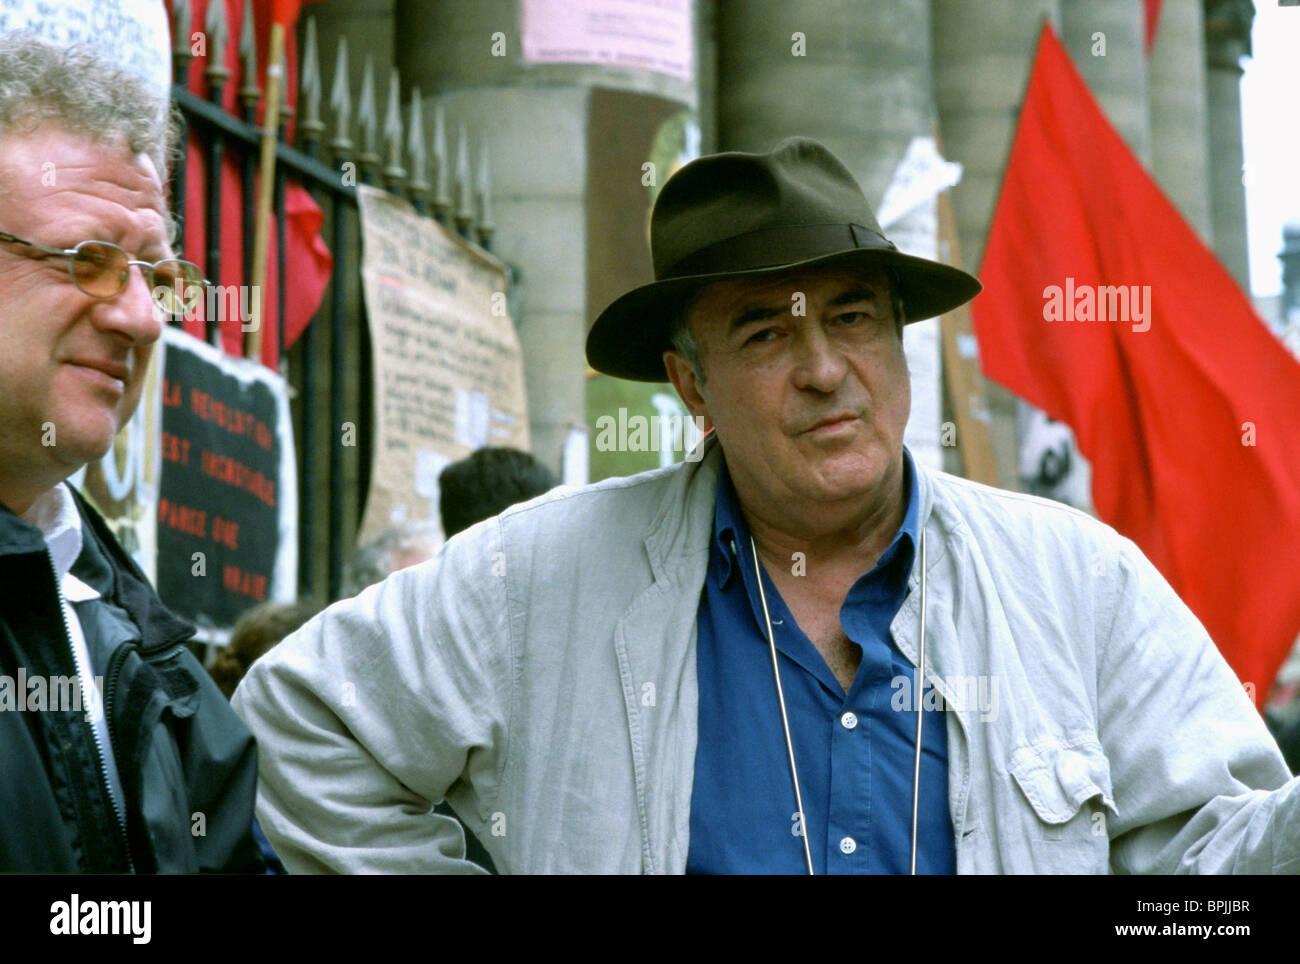 BERNARDO BERTOLUCCI THE DREAMERS (2003) - Stock Image